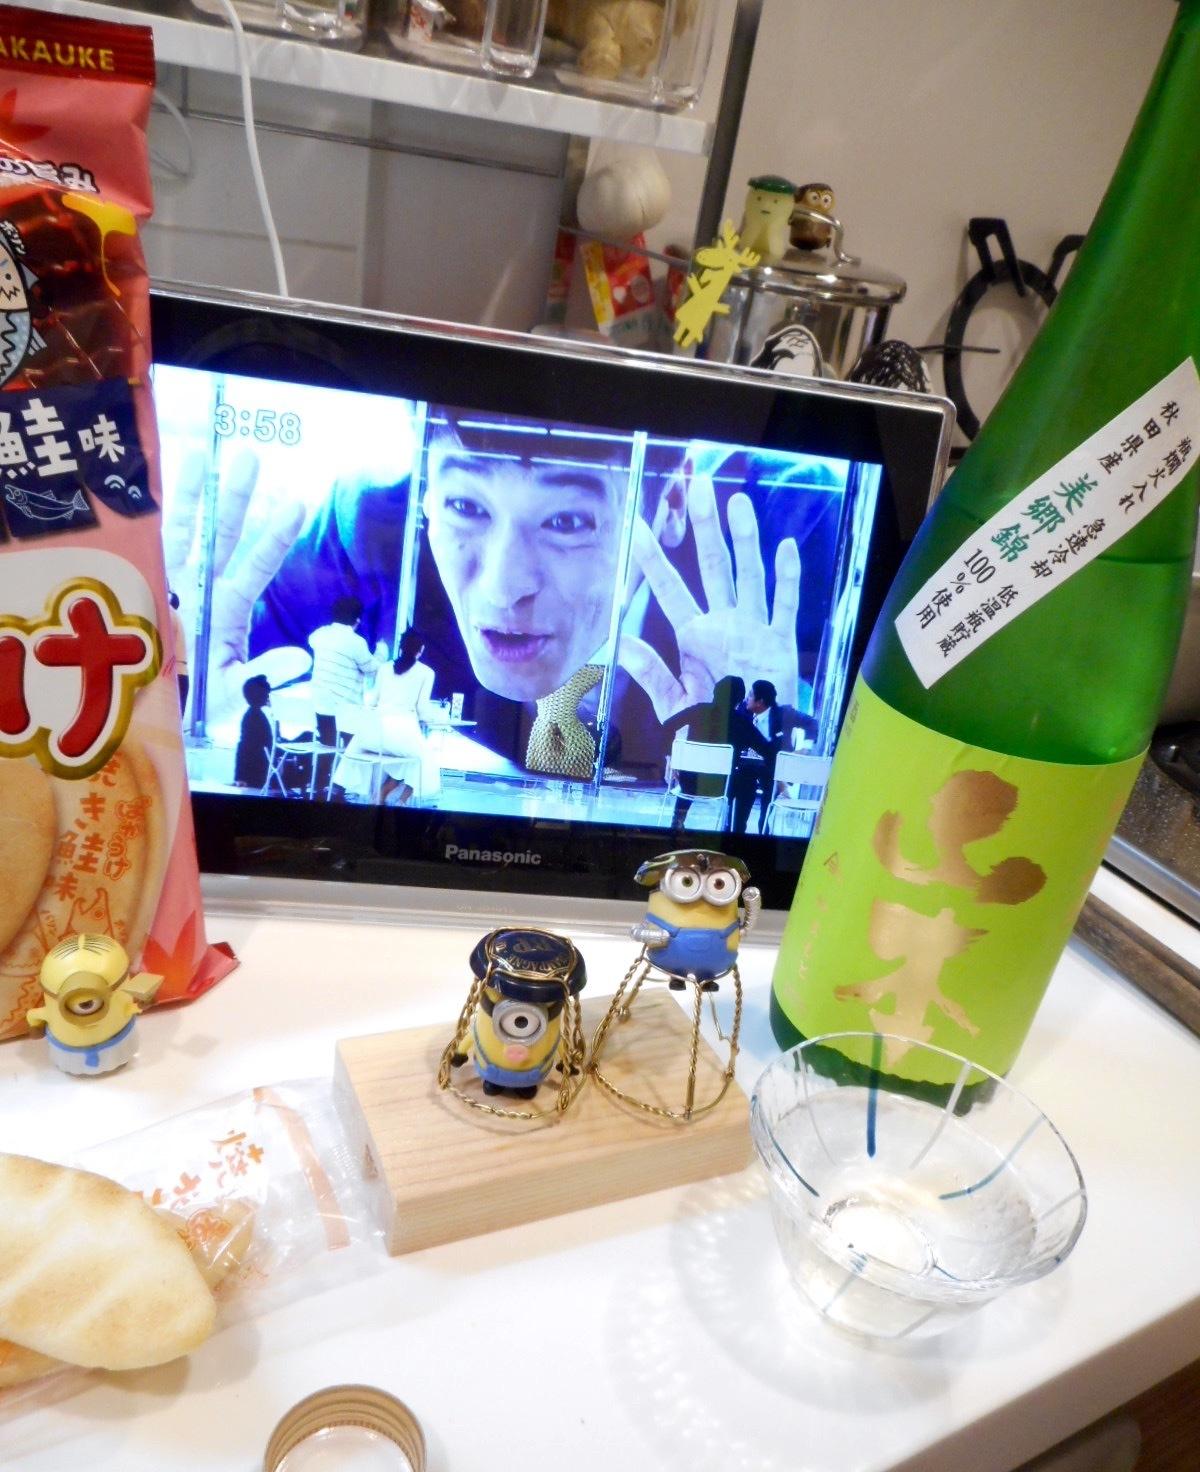 yamamoto_misatonishiki55_28by5.jpg